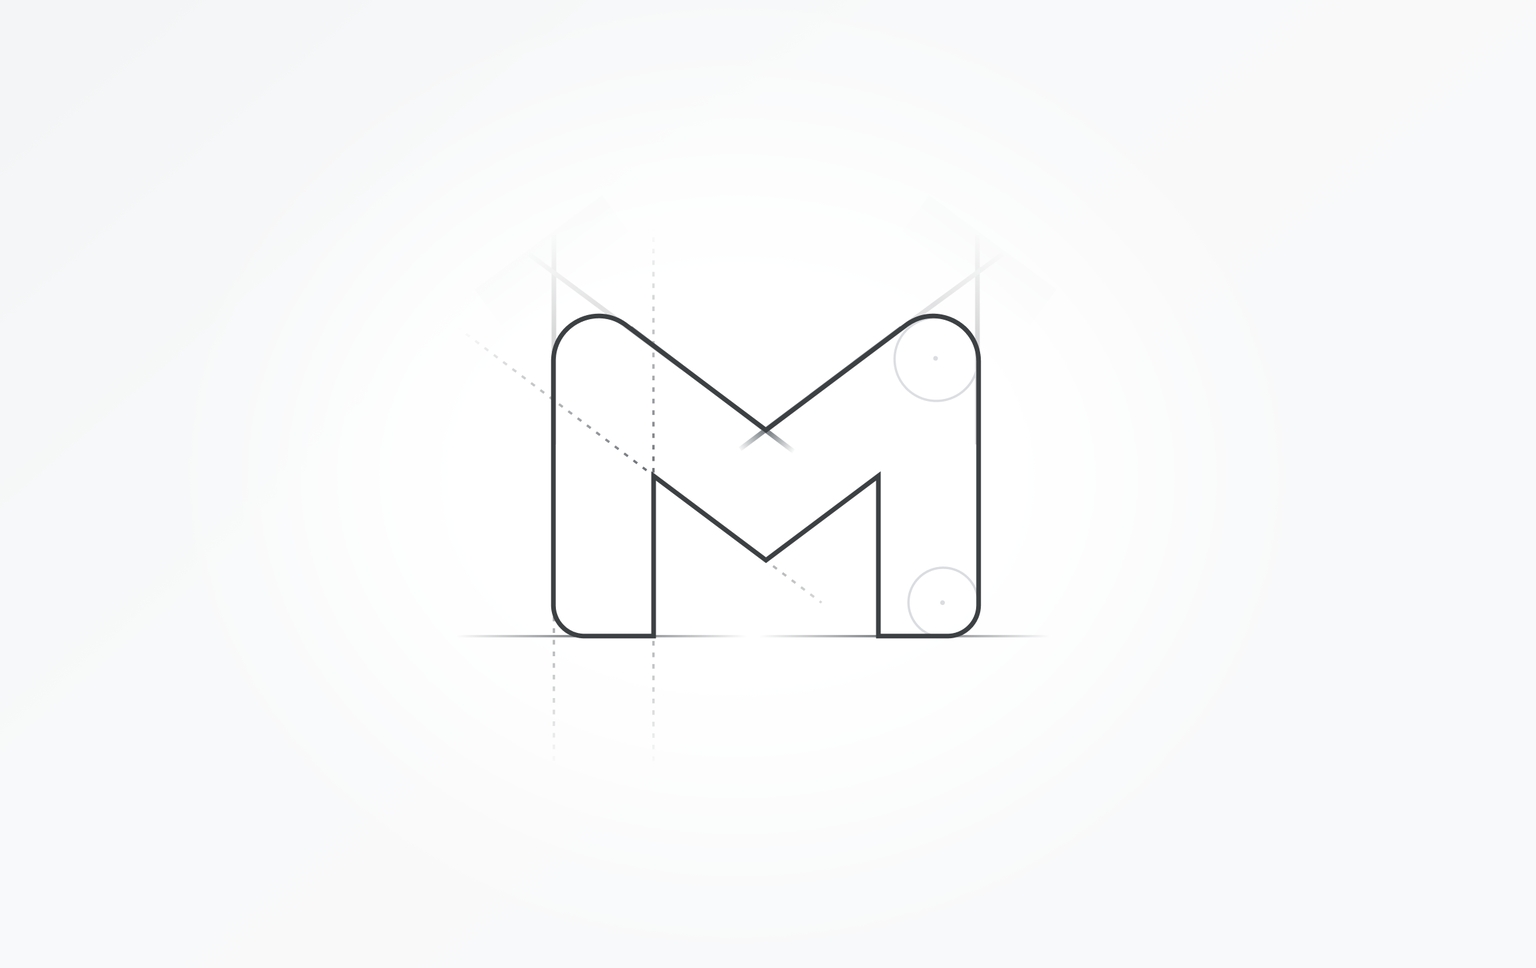 new gmail icon